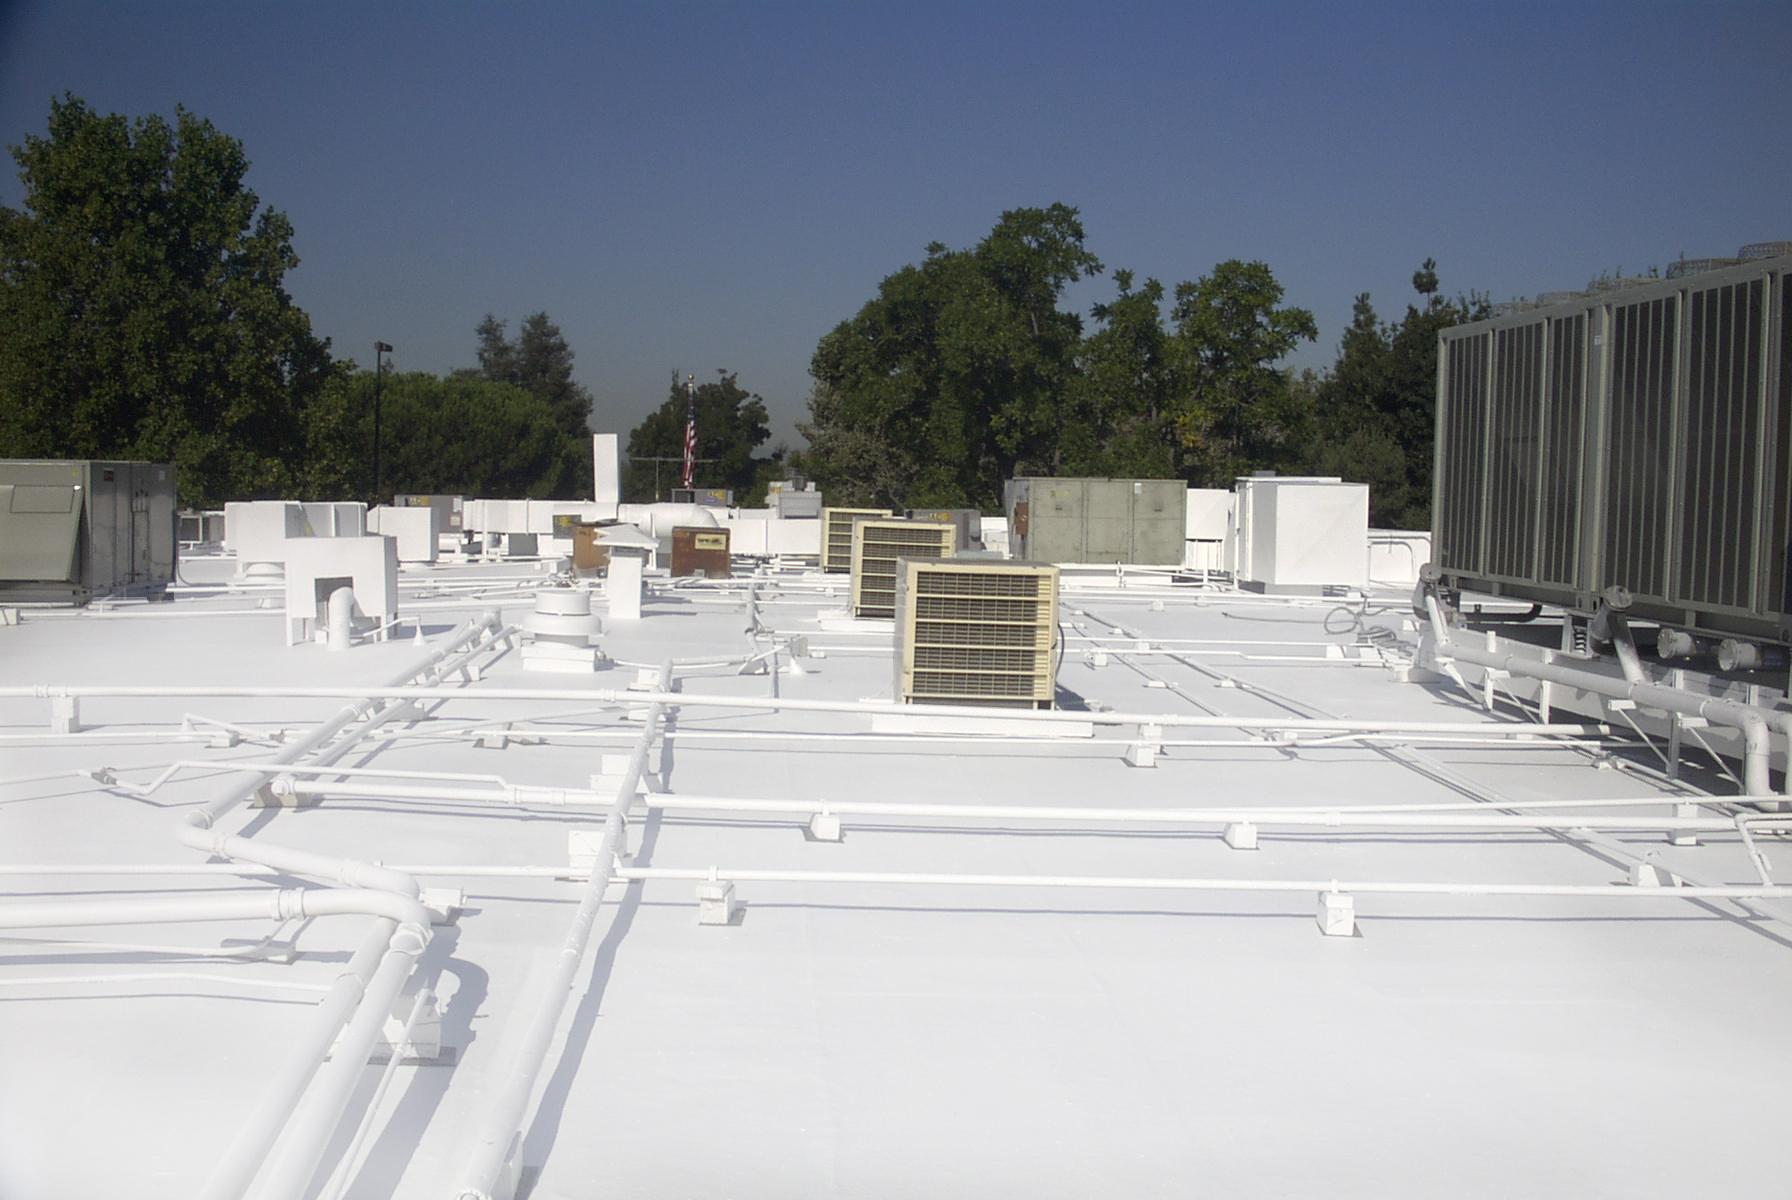 Perfect Elastomeric Roof Coatings Waterproof Around Roof Equipment With No Hassle